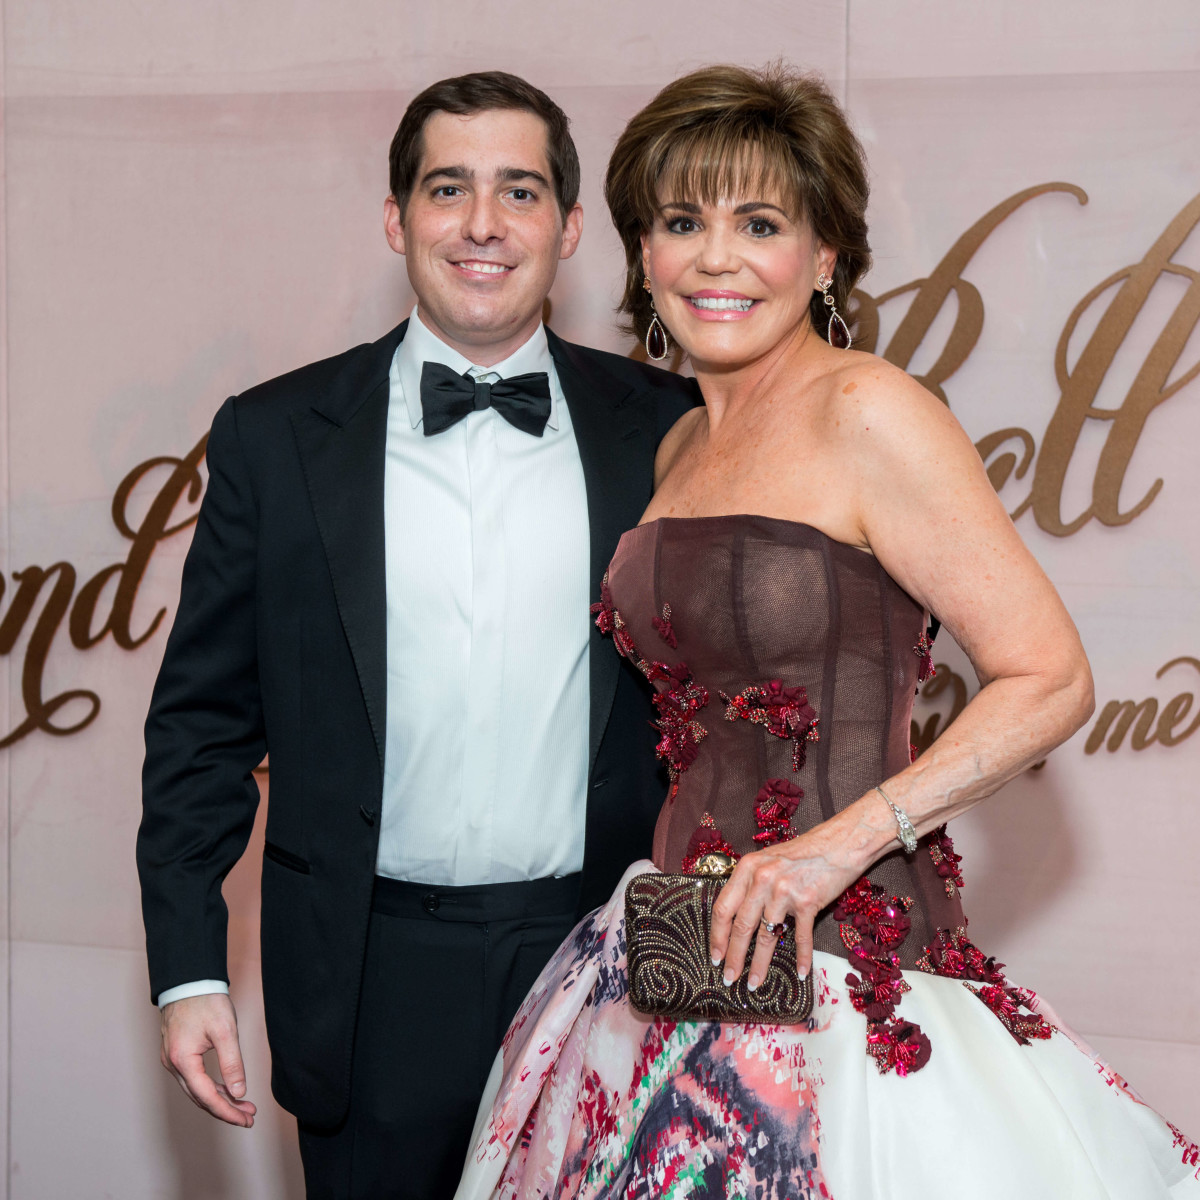 Michael Vanderhider, Hallie Vanderhider at Museum of Fine Arts Grand Gala Ball